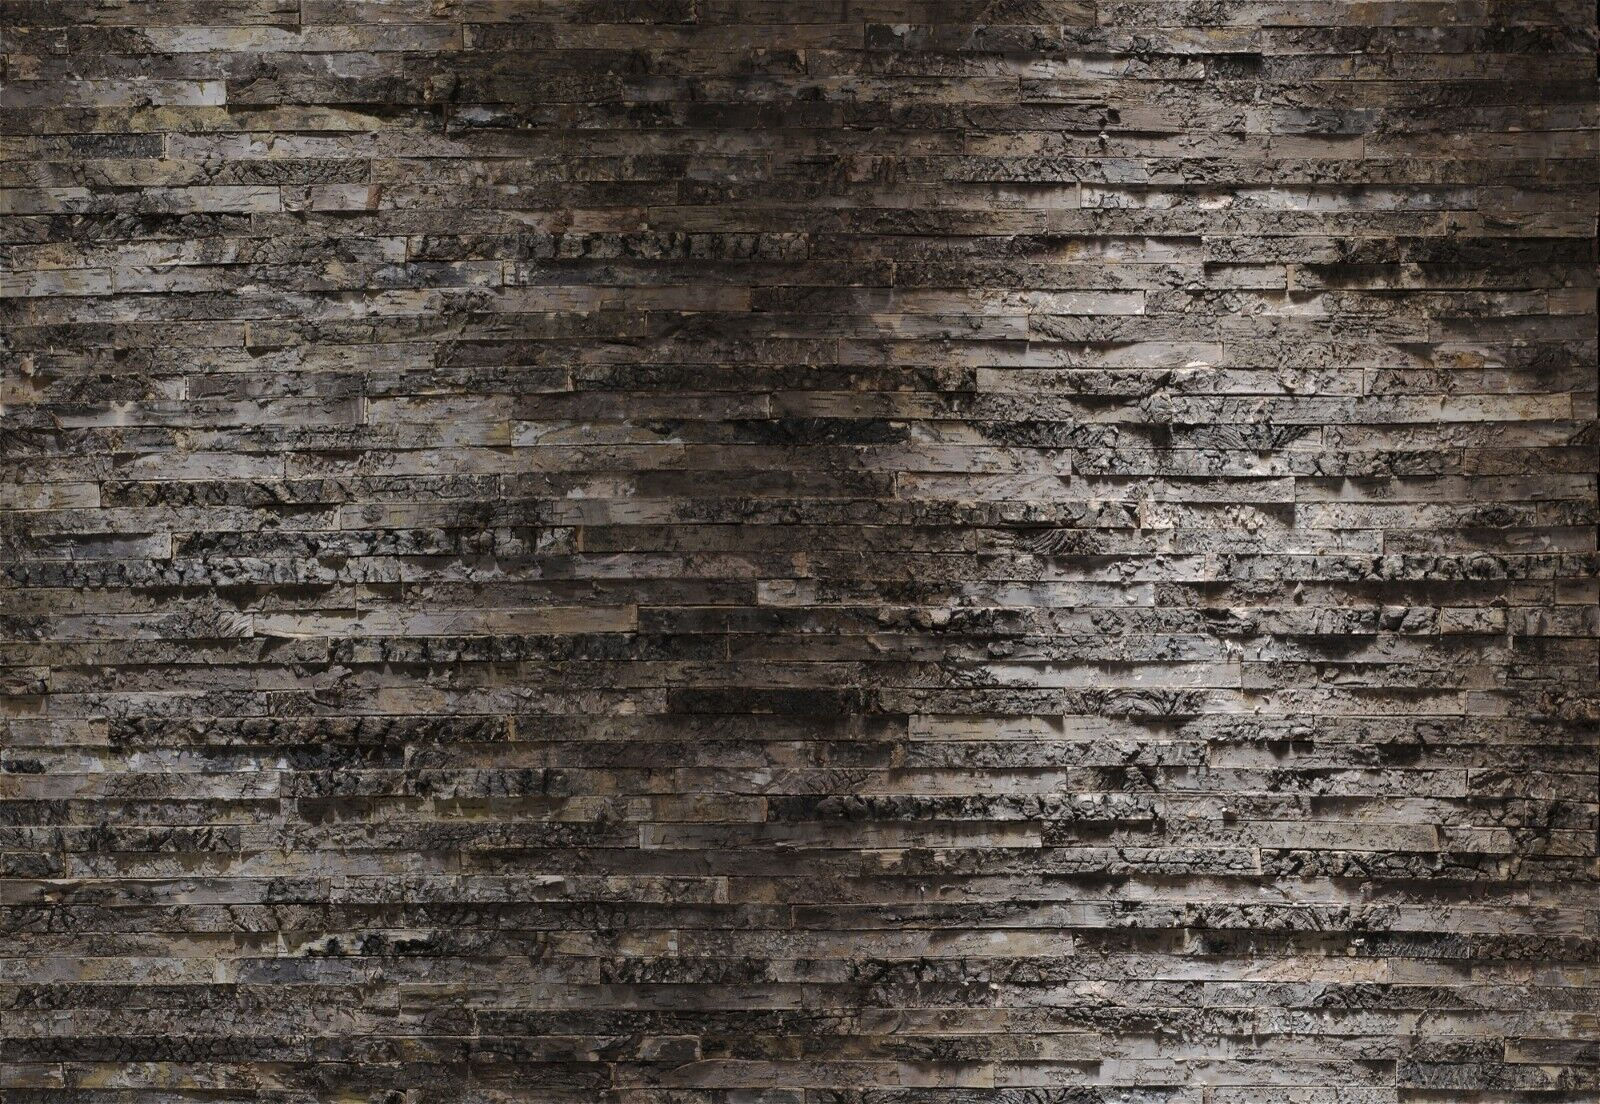 Fototapete Birkenrinde - Holzoptik 368 x 254 cm - inkl. Kleister - Papier